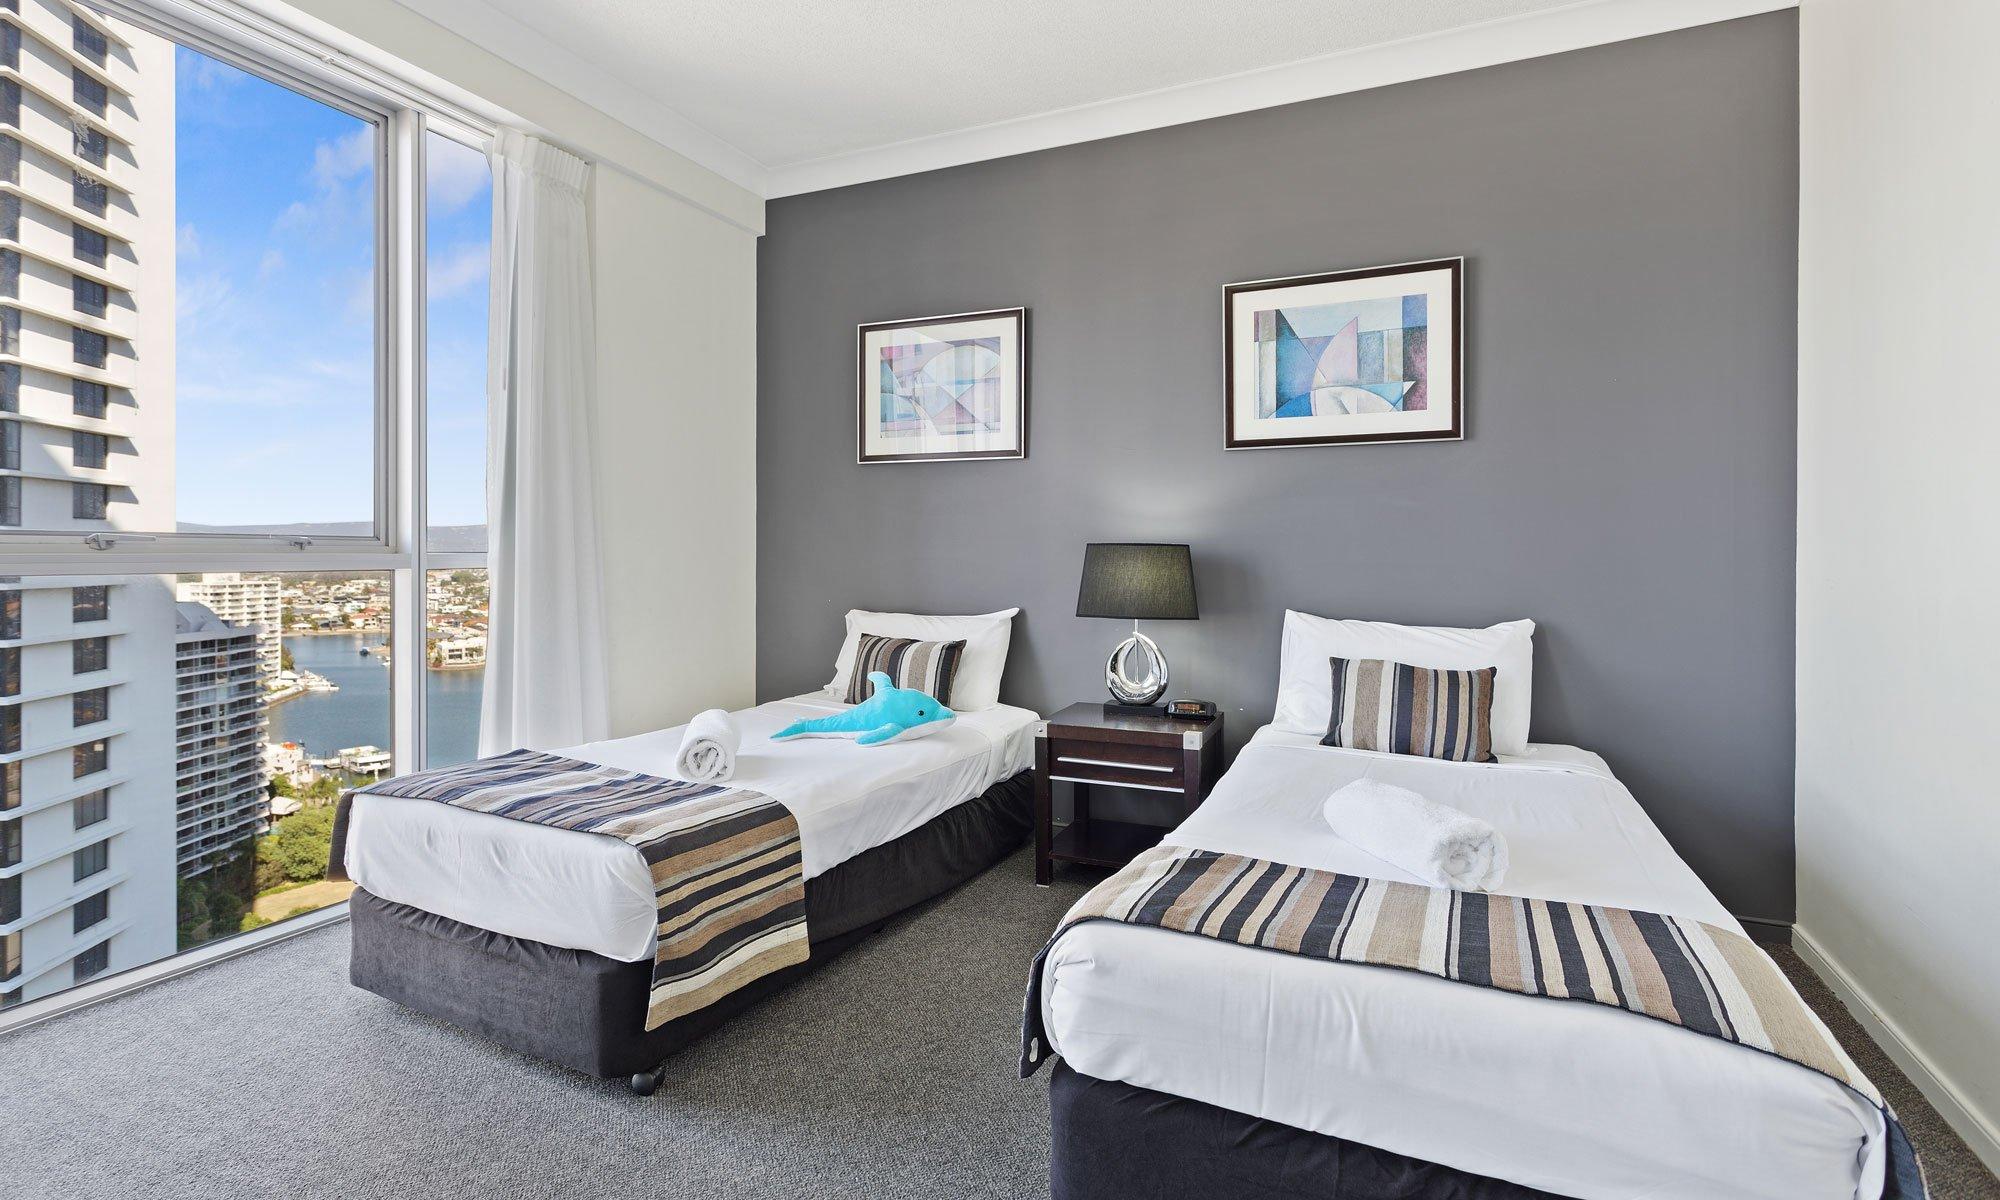 Gold Coast real estate for sale Chevron Renaissance 1171 third bedroom